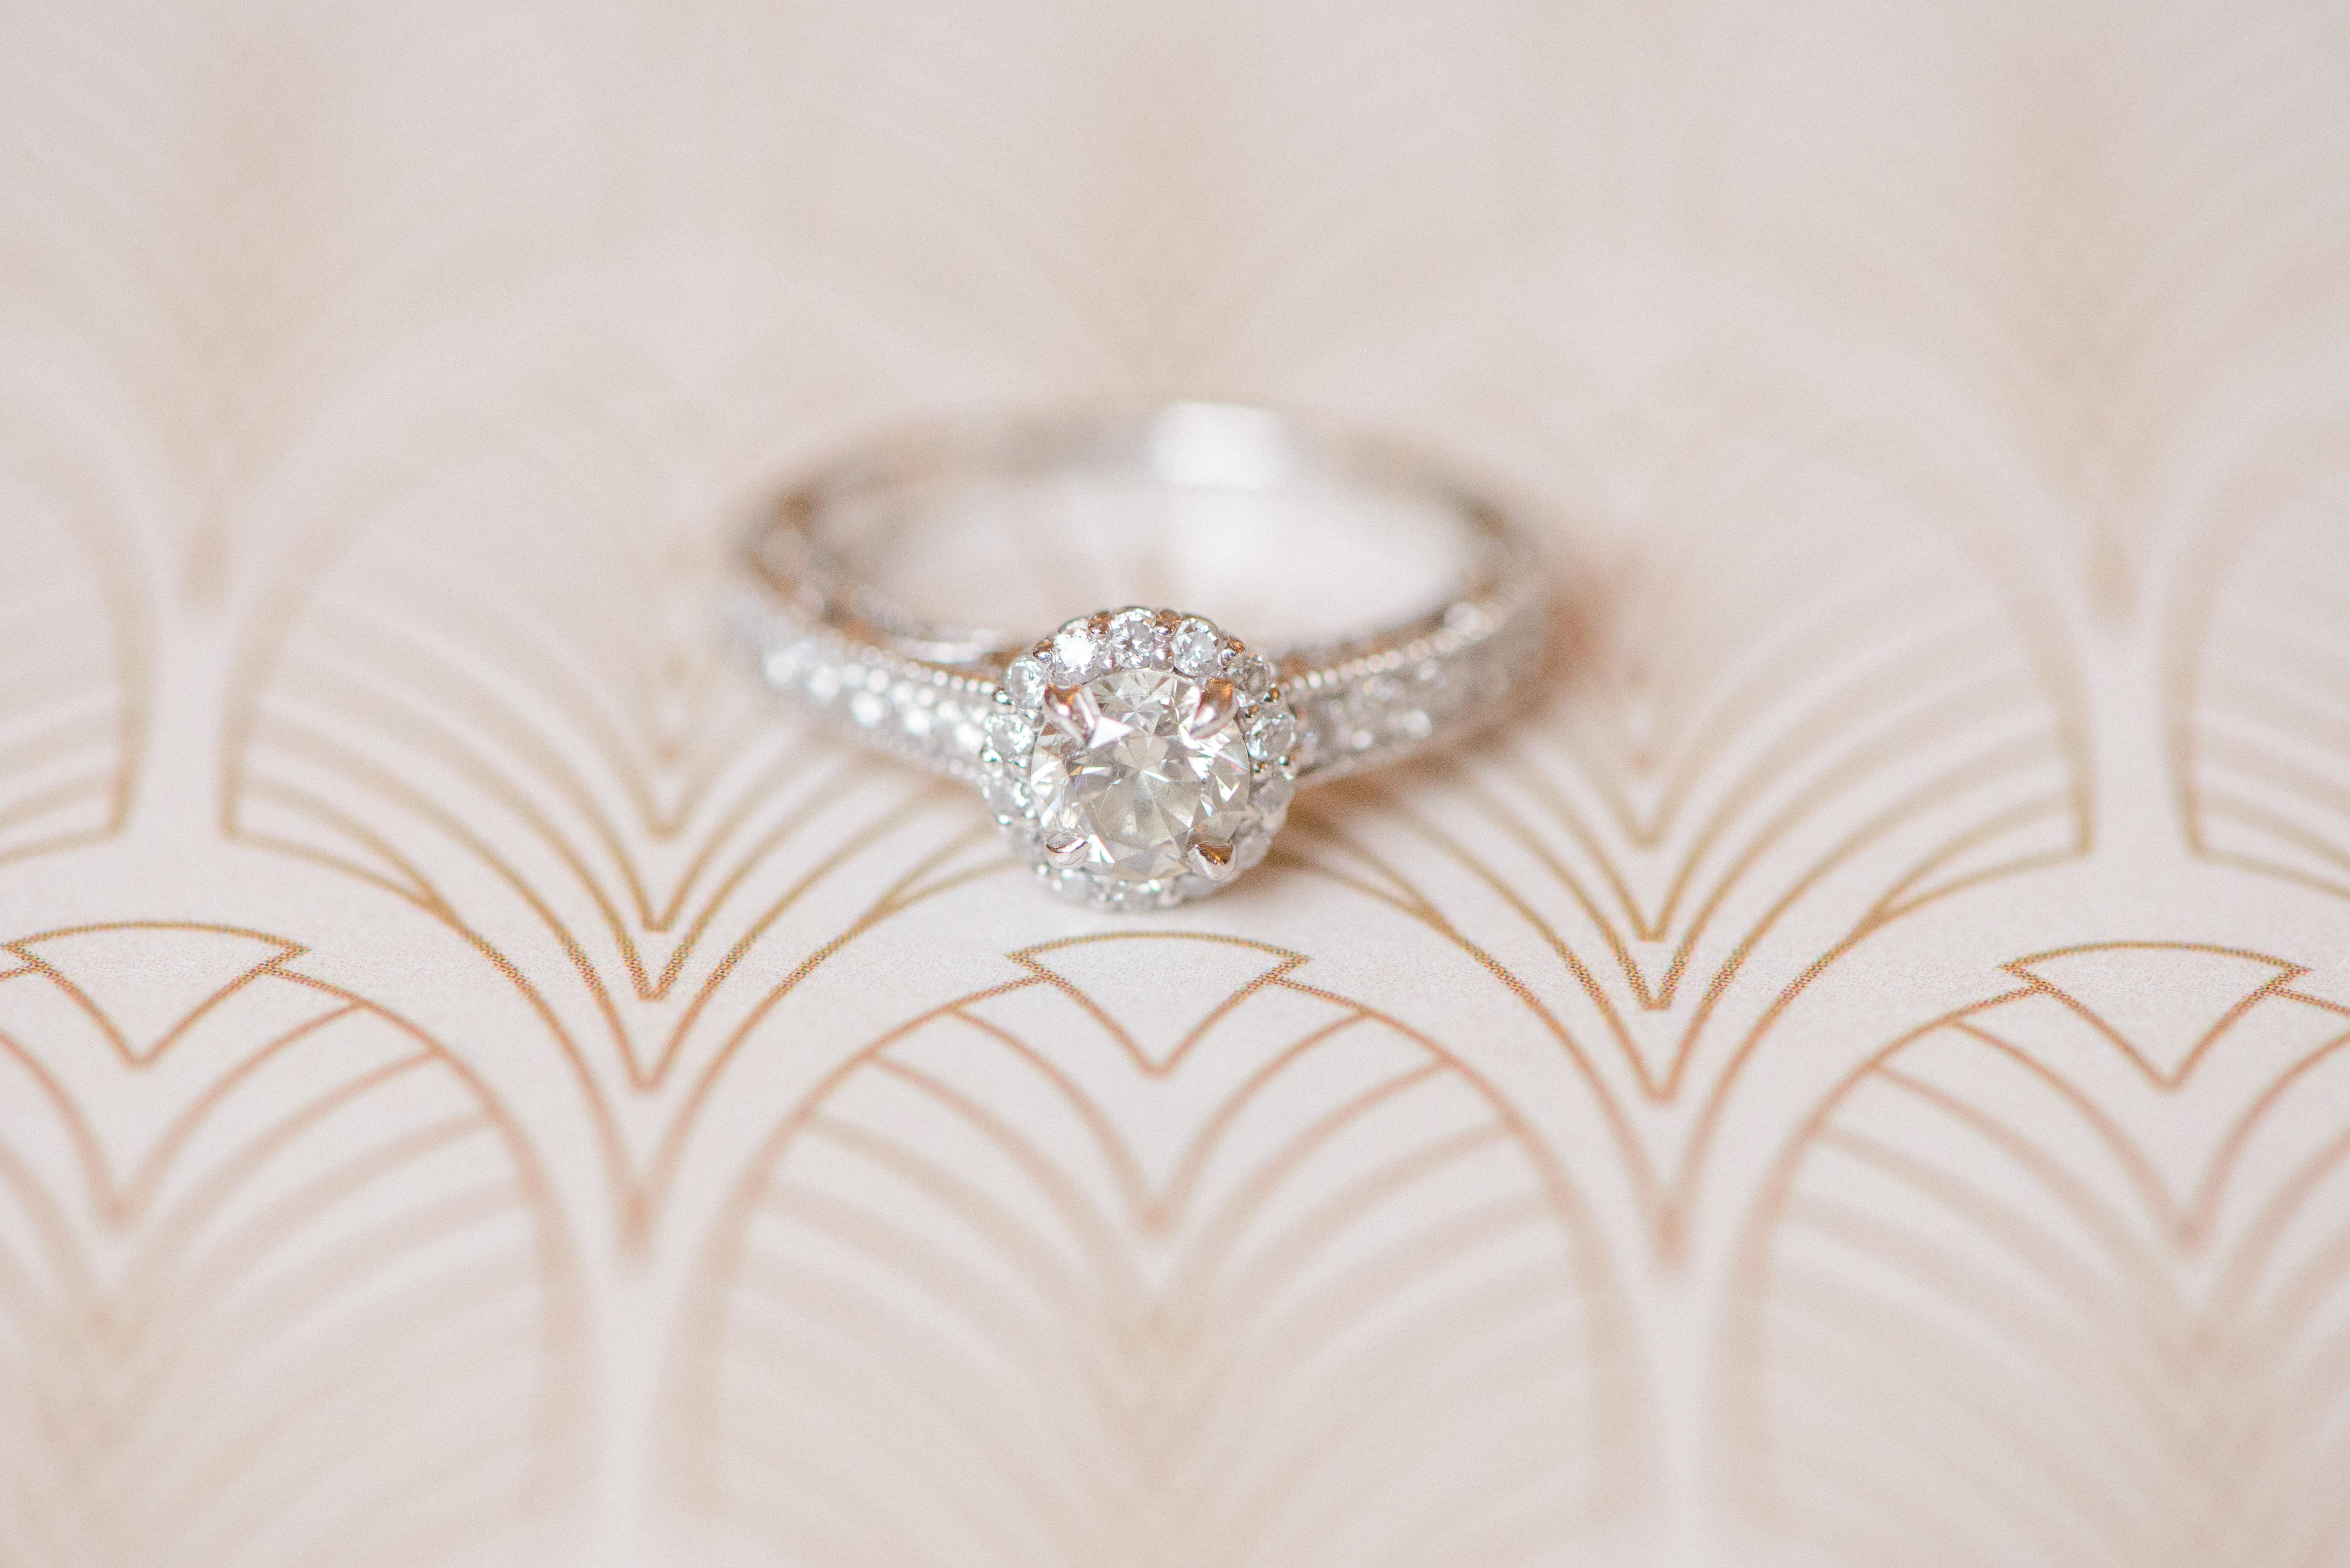 Rings Jewelry WeddingWire